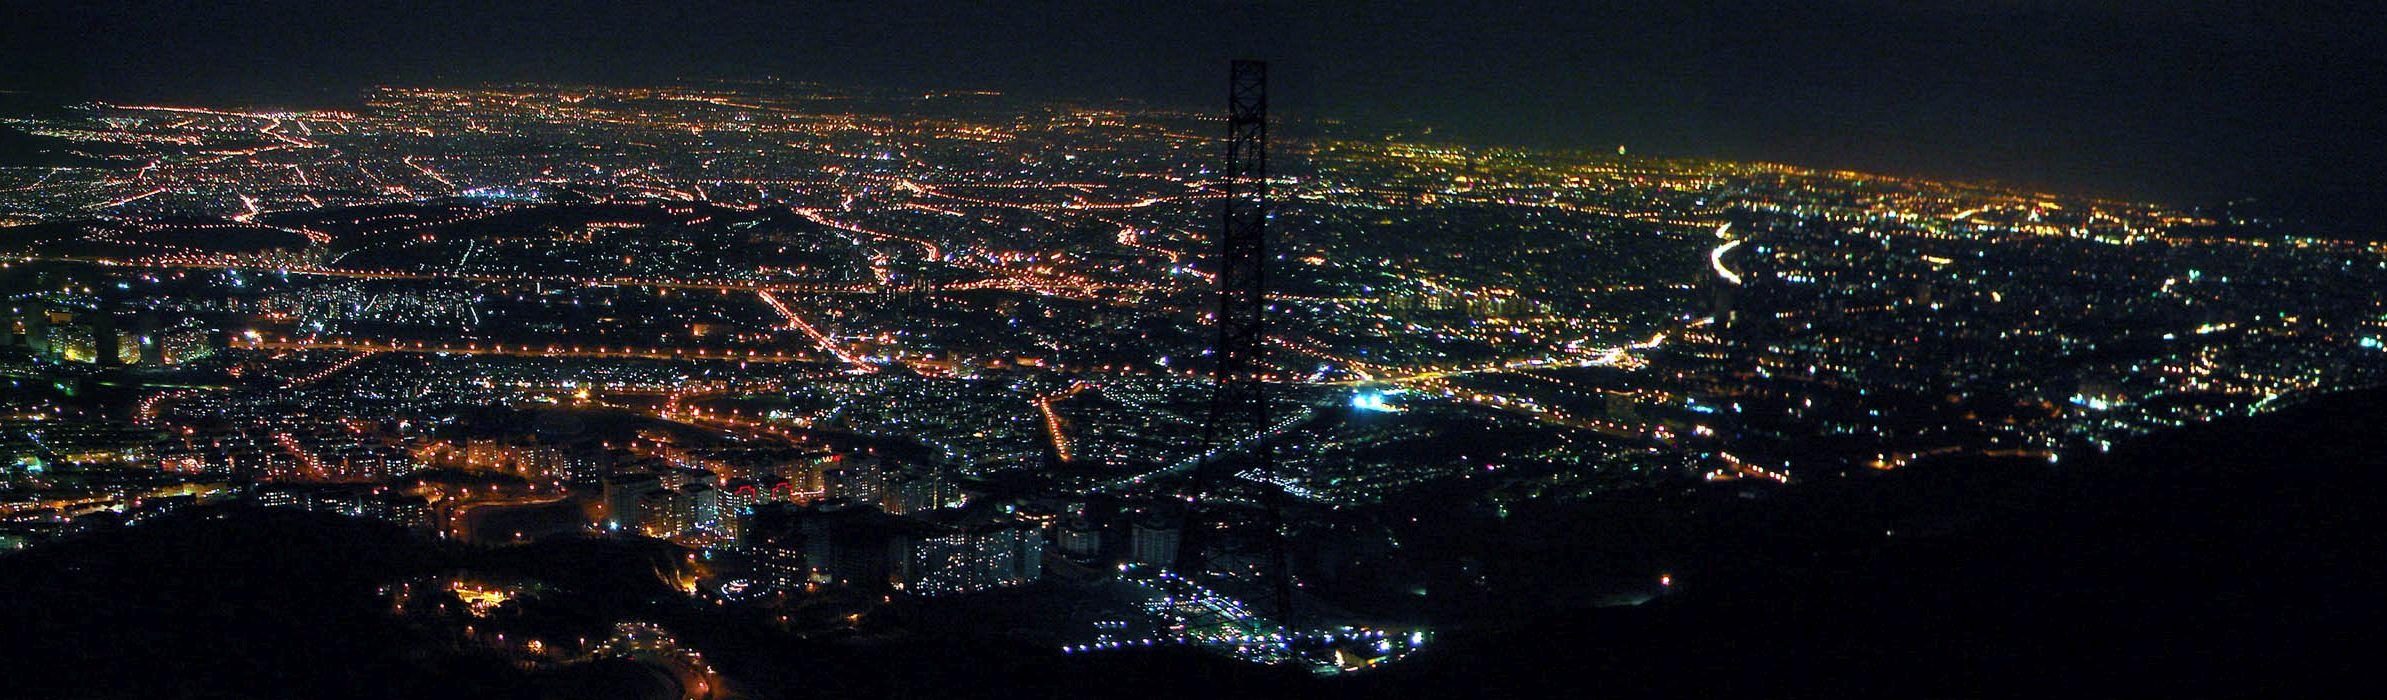 Teheran nocą (fot. Hamed Saber, Creative Commons Attribution 2.0 Generic)